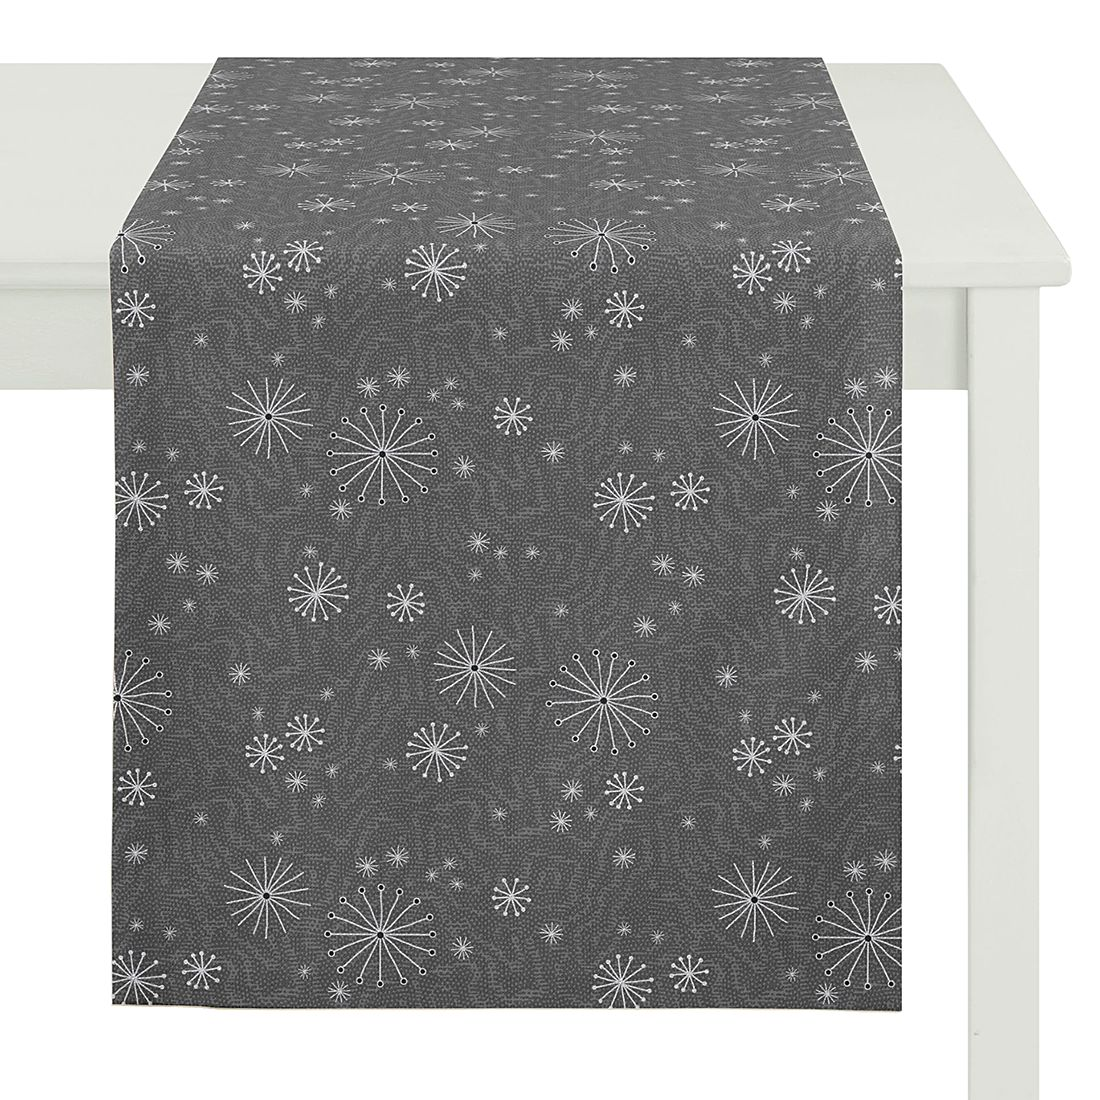 Tischläufer Christmas Elegance I – Grau, Apelt online bestellen